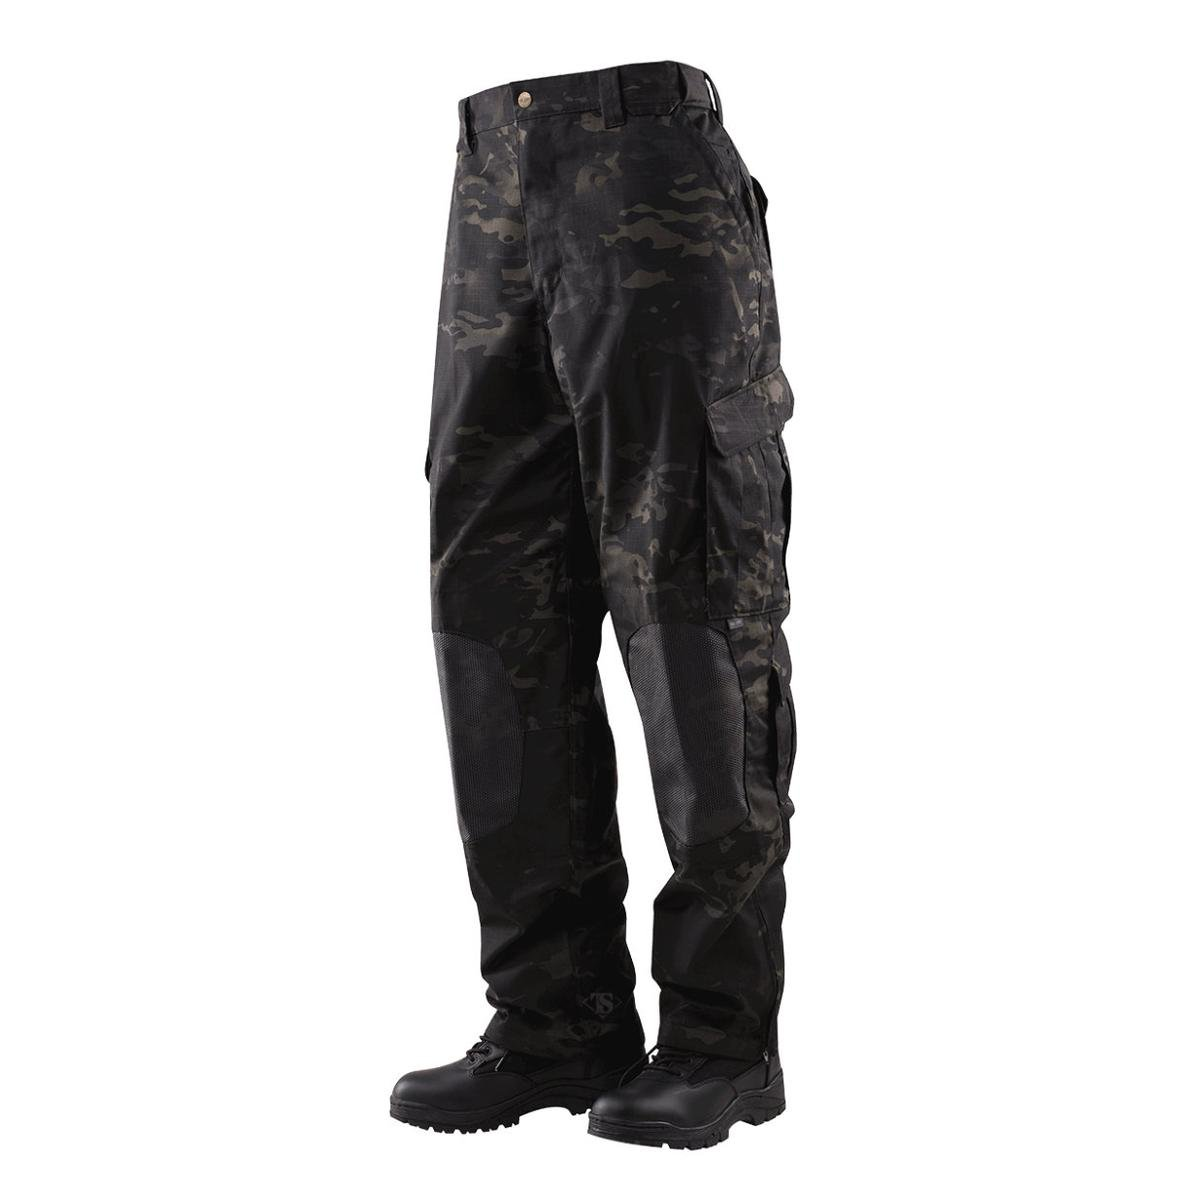 Tru-Spec TRU XTREME Pant, Multicam Black, XLL 1239026